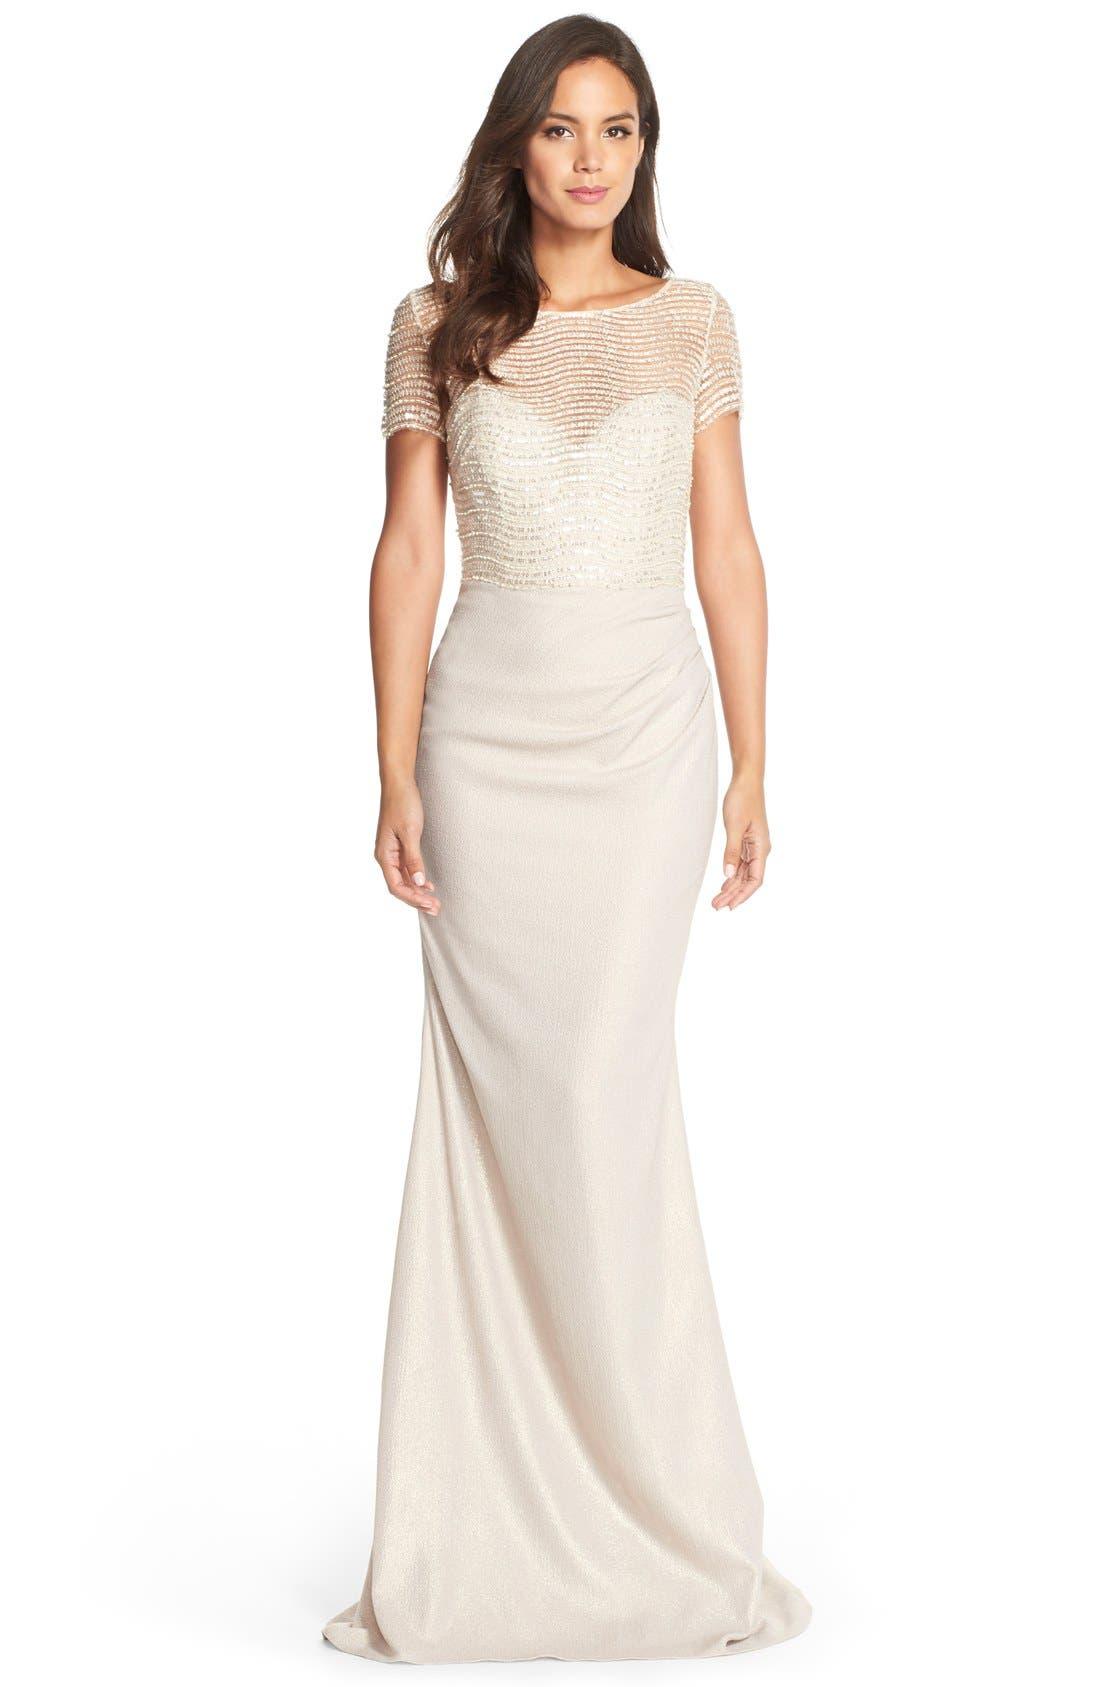 Main Image - Badgley Mischka Embellished Illusion Crepe Gown